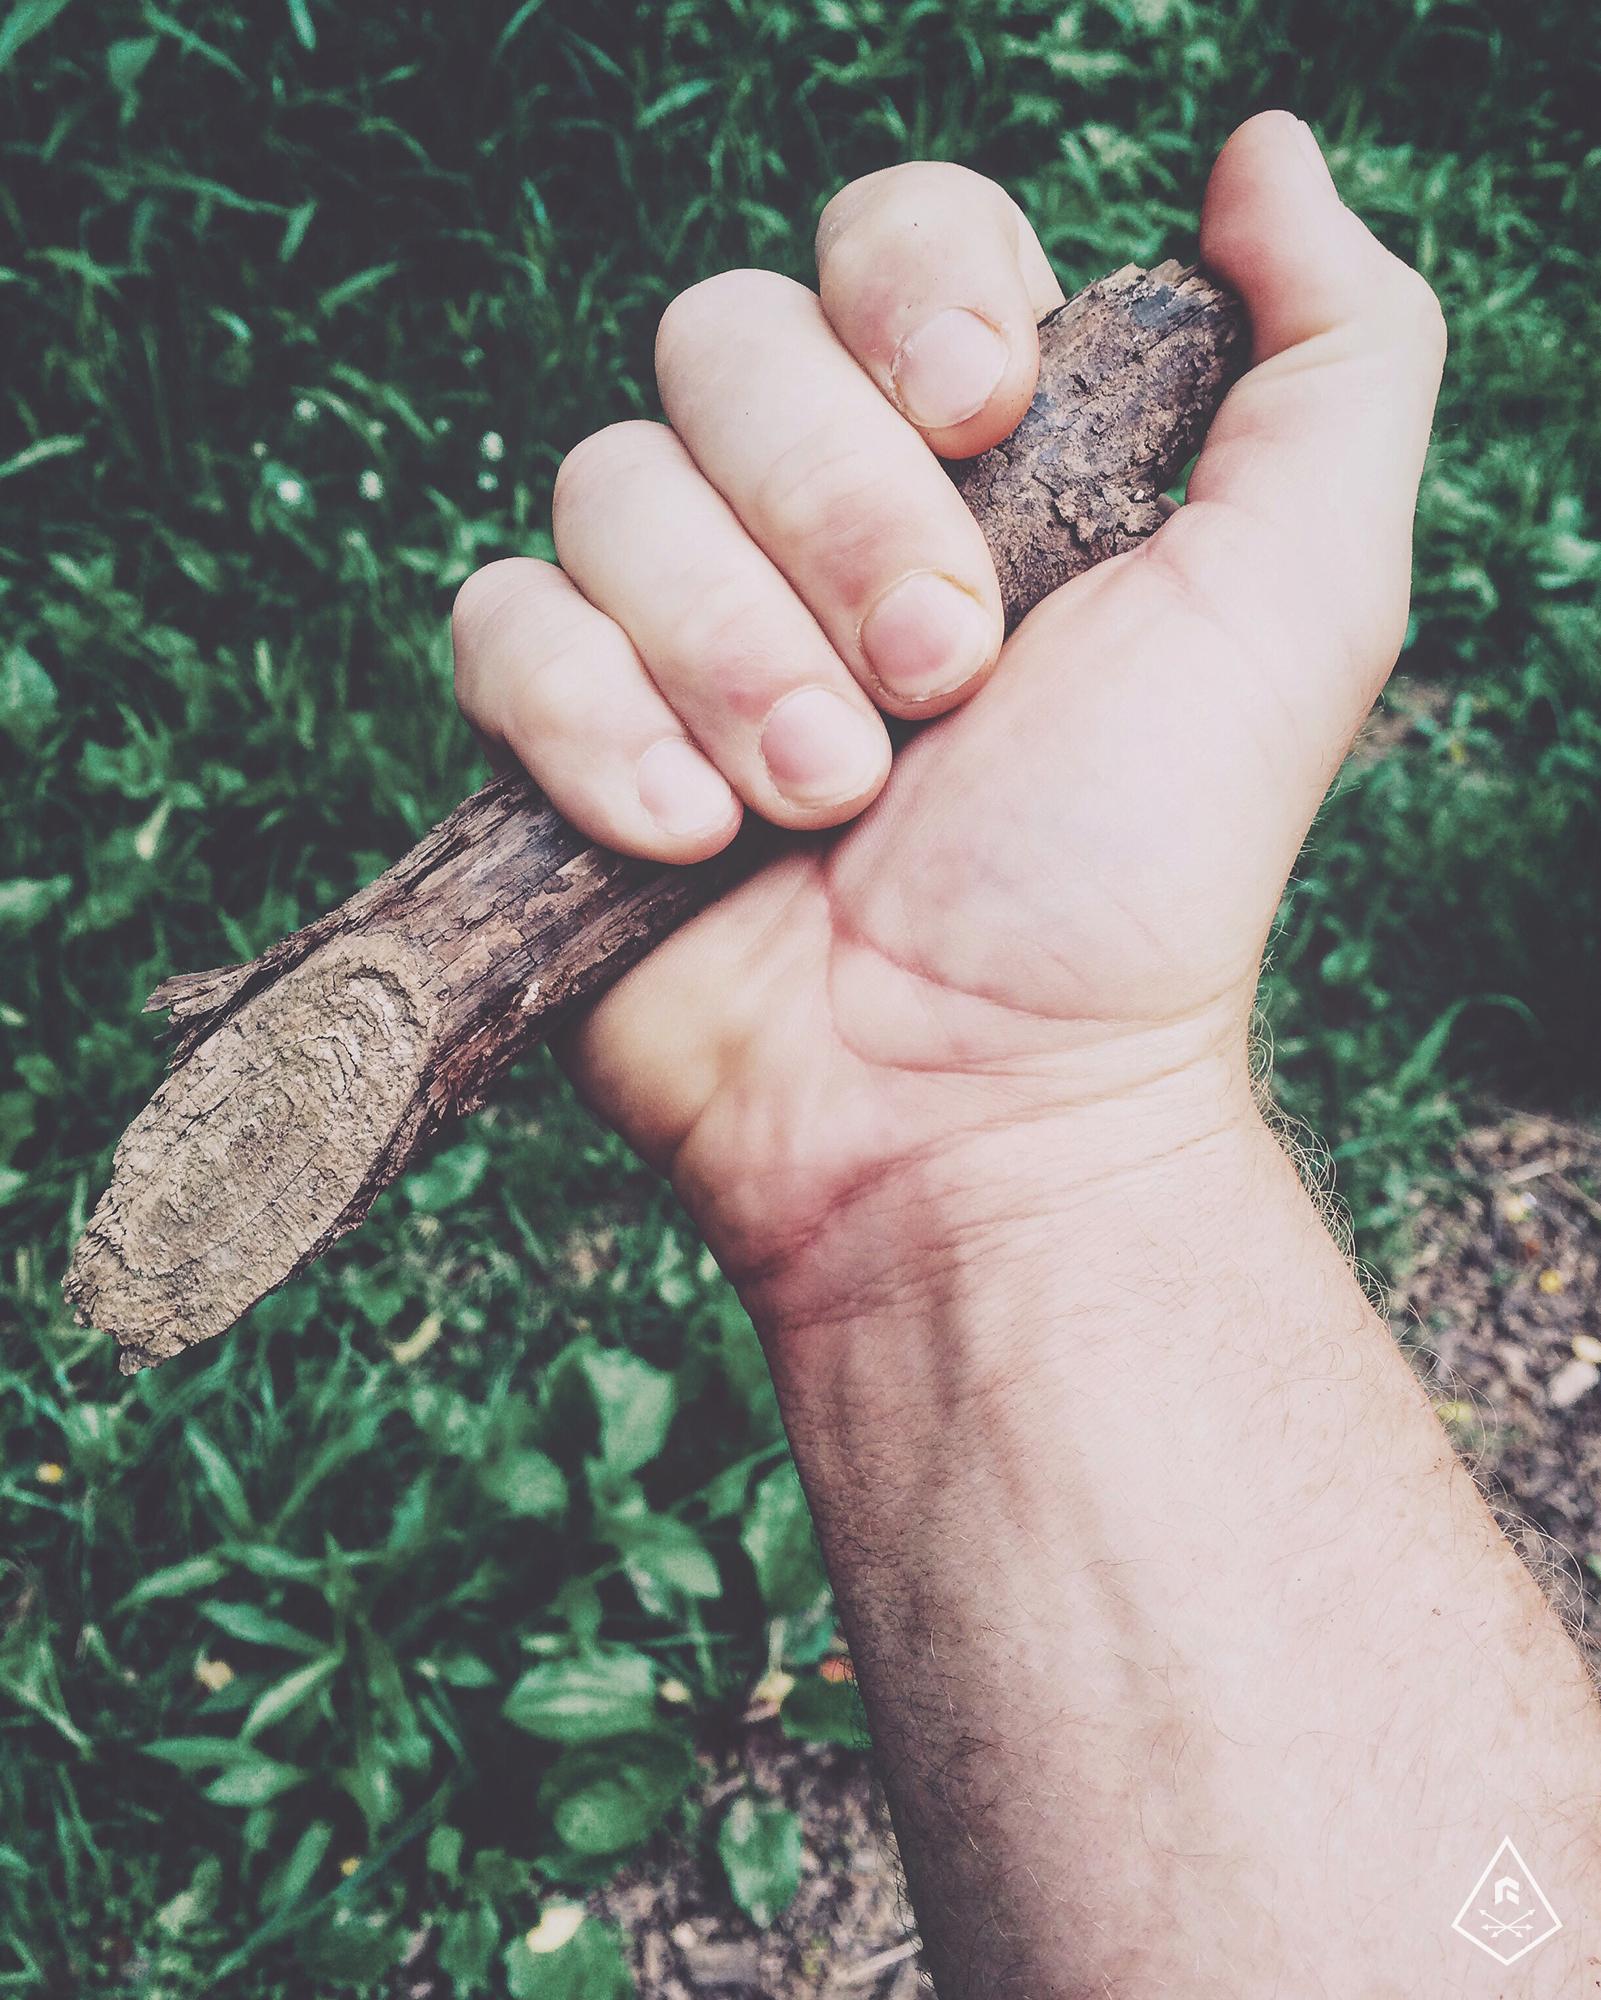 improvised-palm-stick.jpg